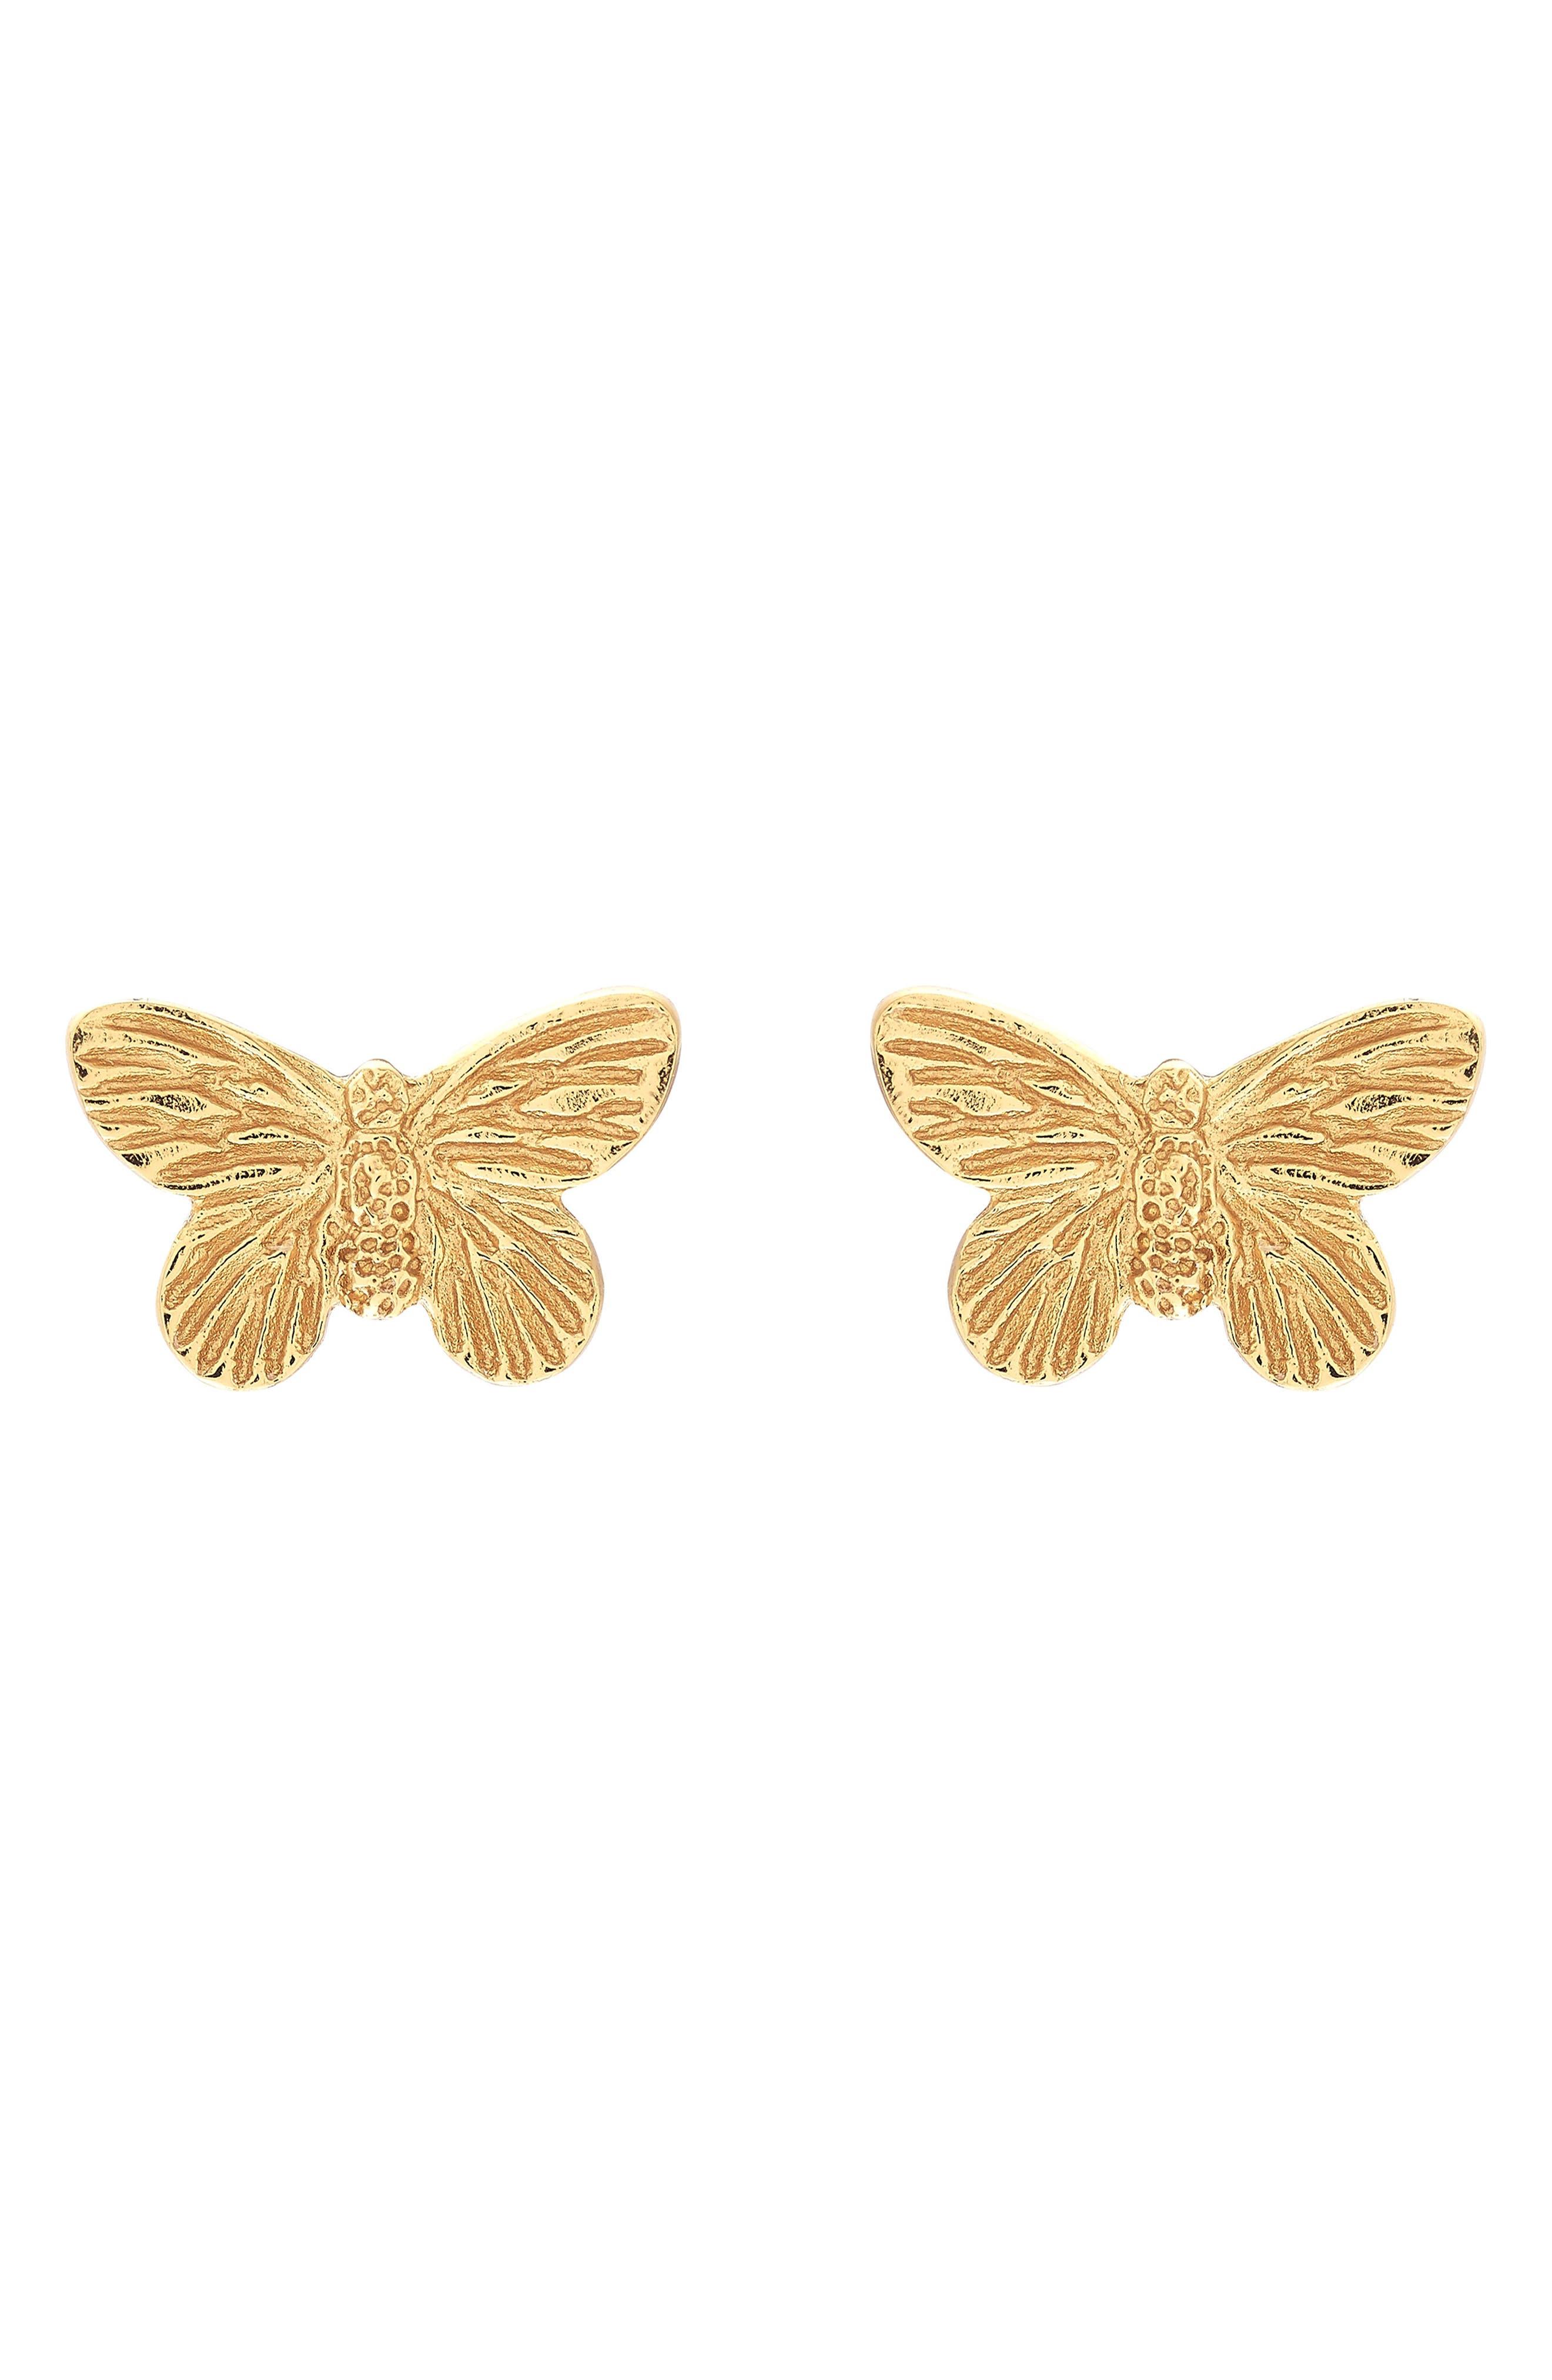 3D Butterfly Stud Earrings,                             Alternate thumbnail 3, color,                             GOLD